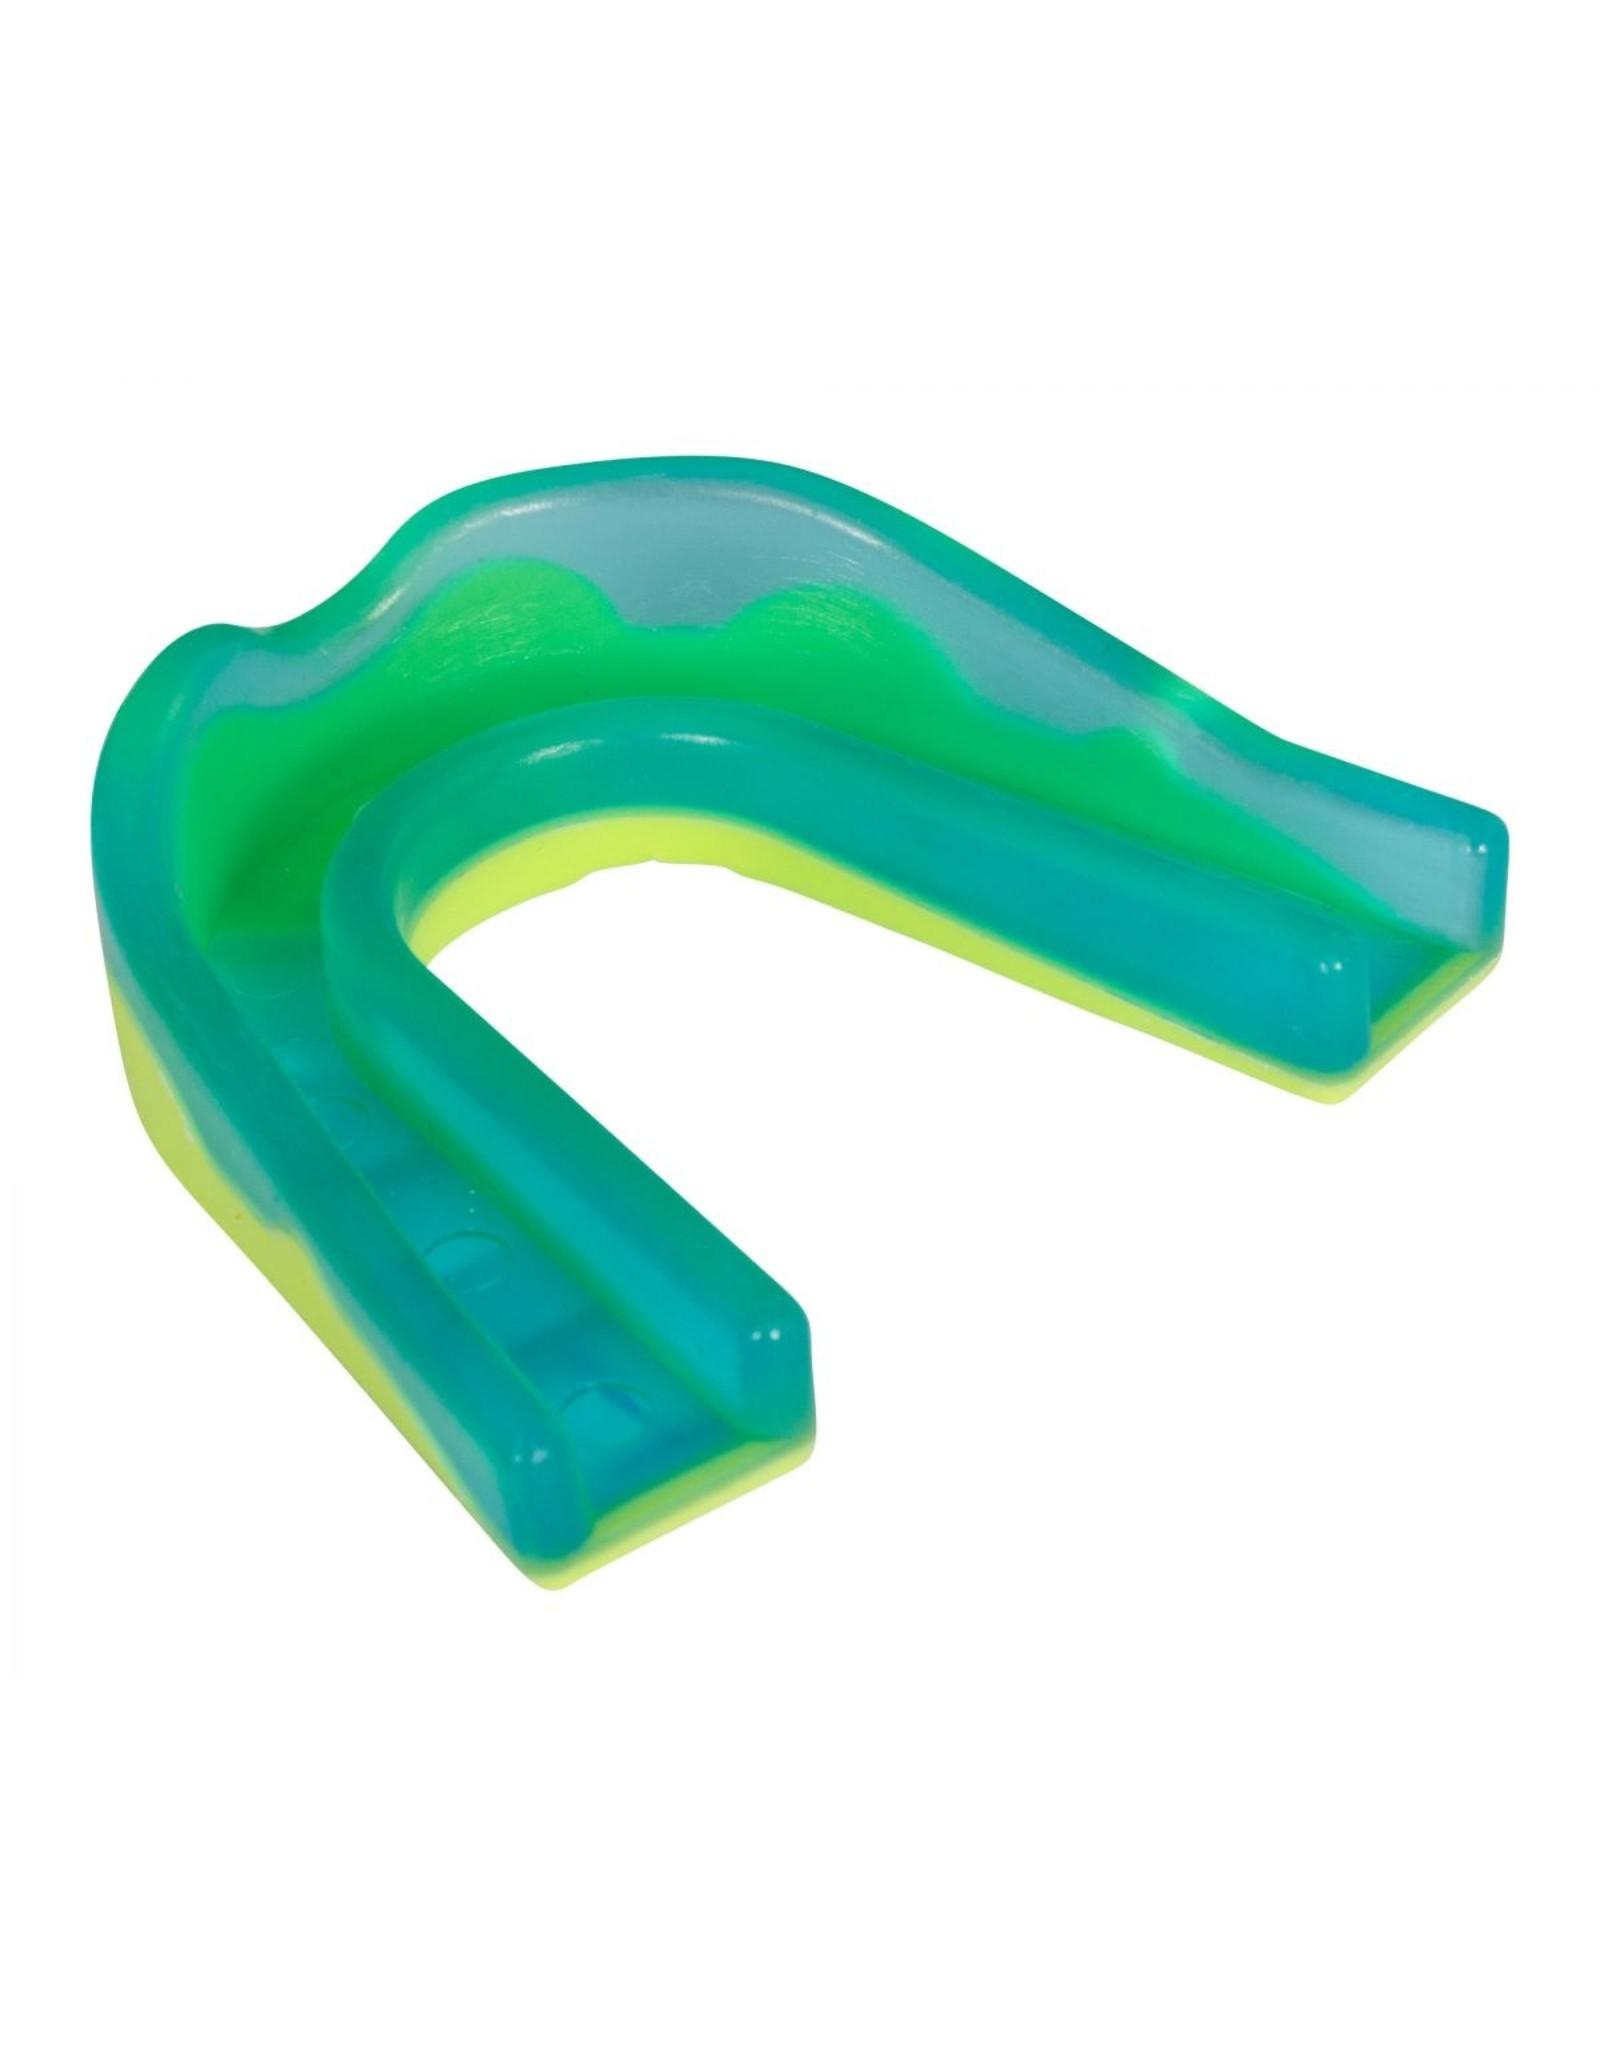 Reece Australia Mouthguard Dental Impact Shield